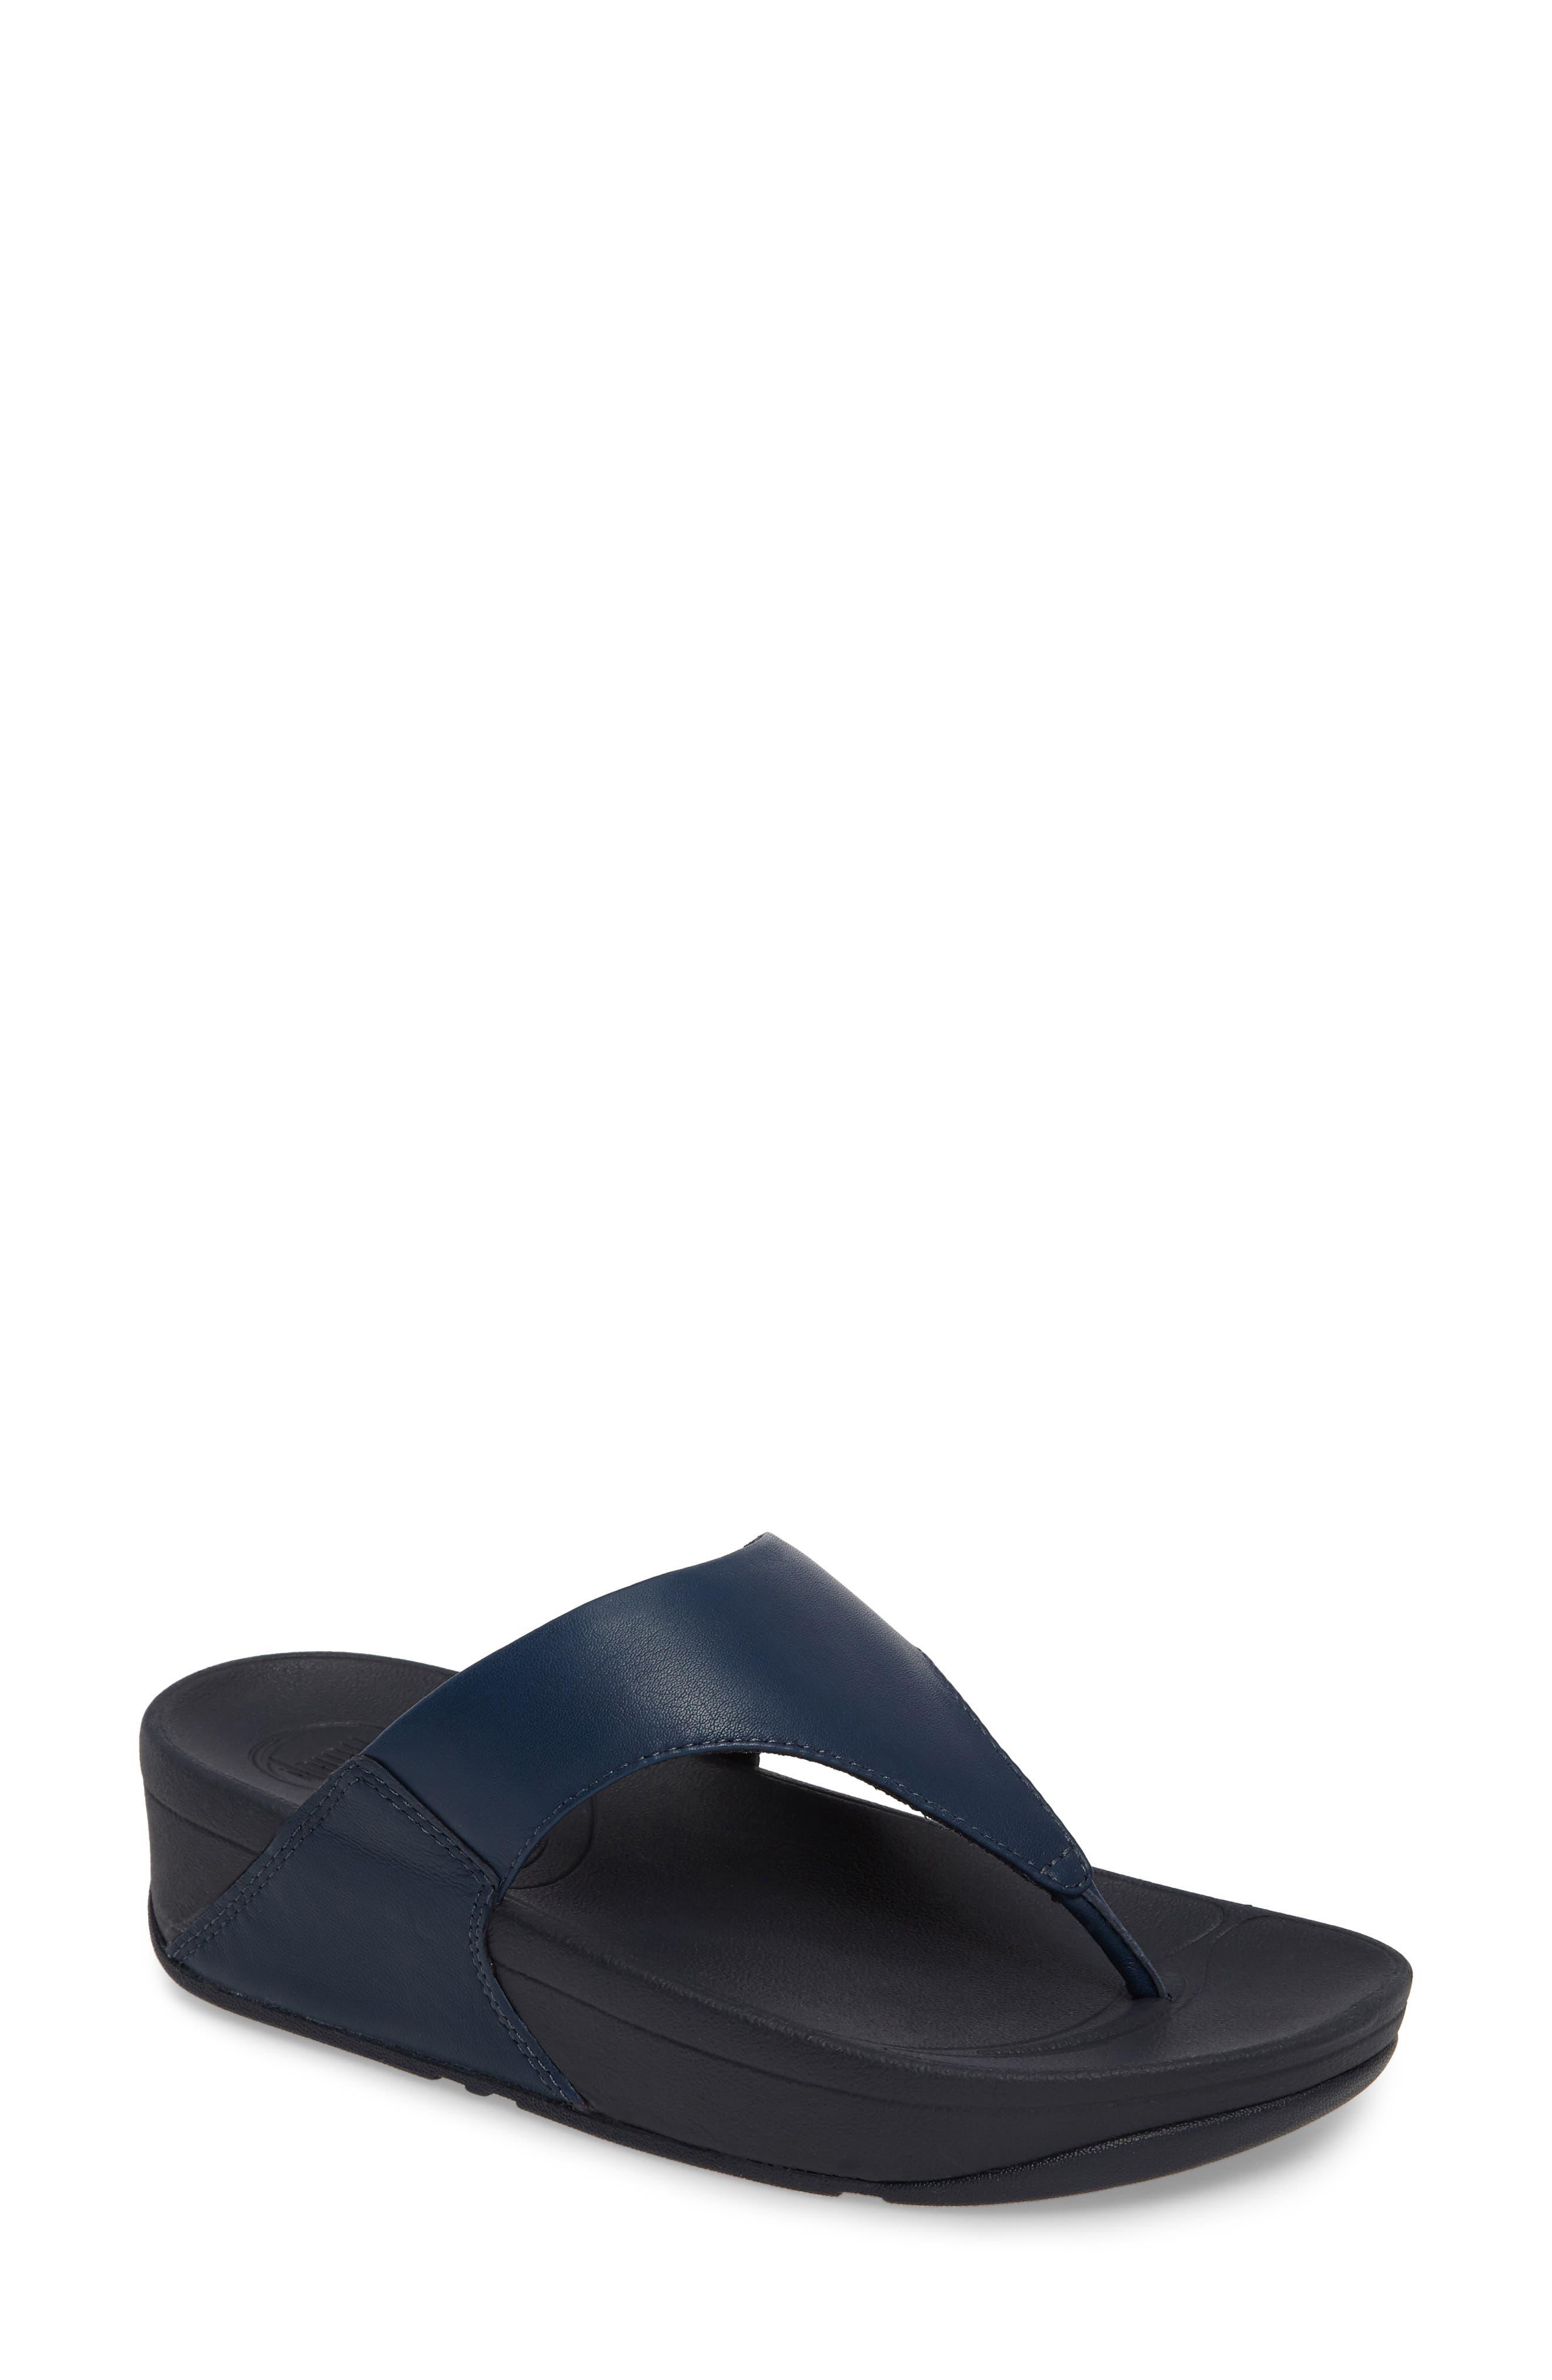 Alternate Image 1 Selected - FitFlop Lulu Sandal